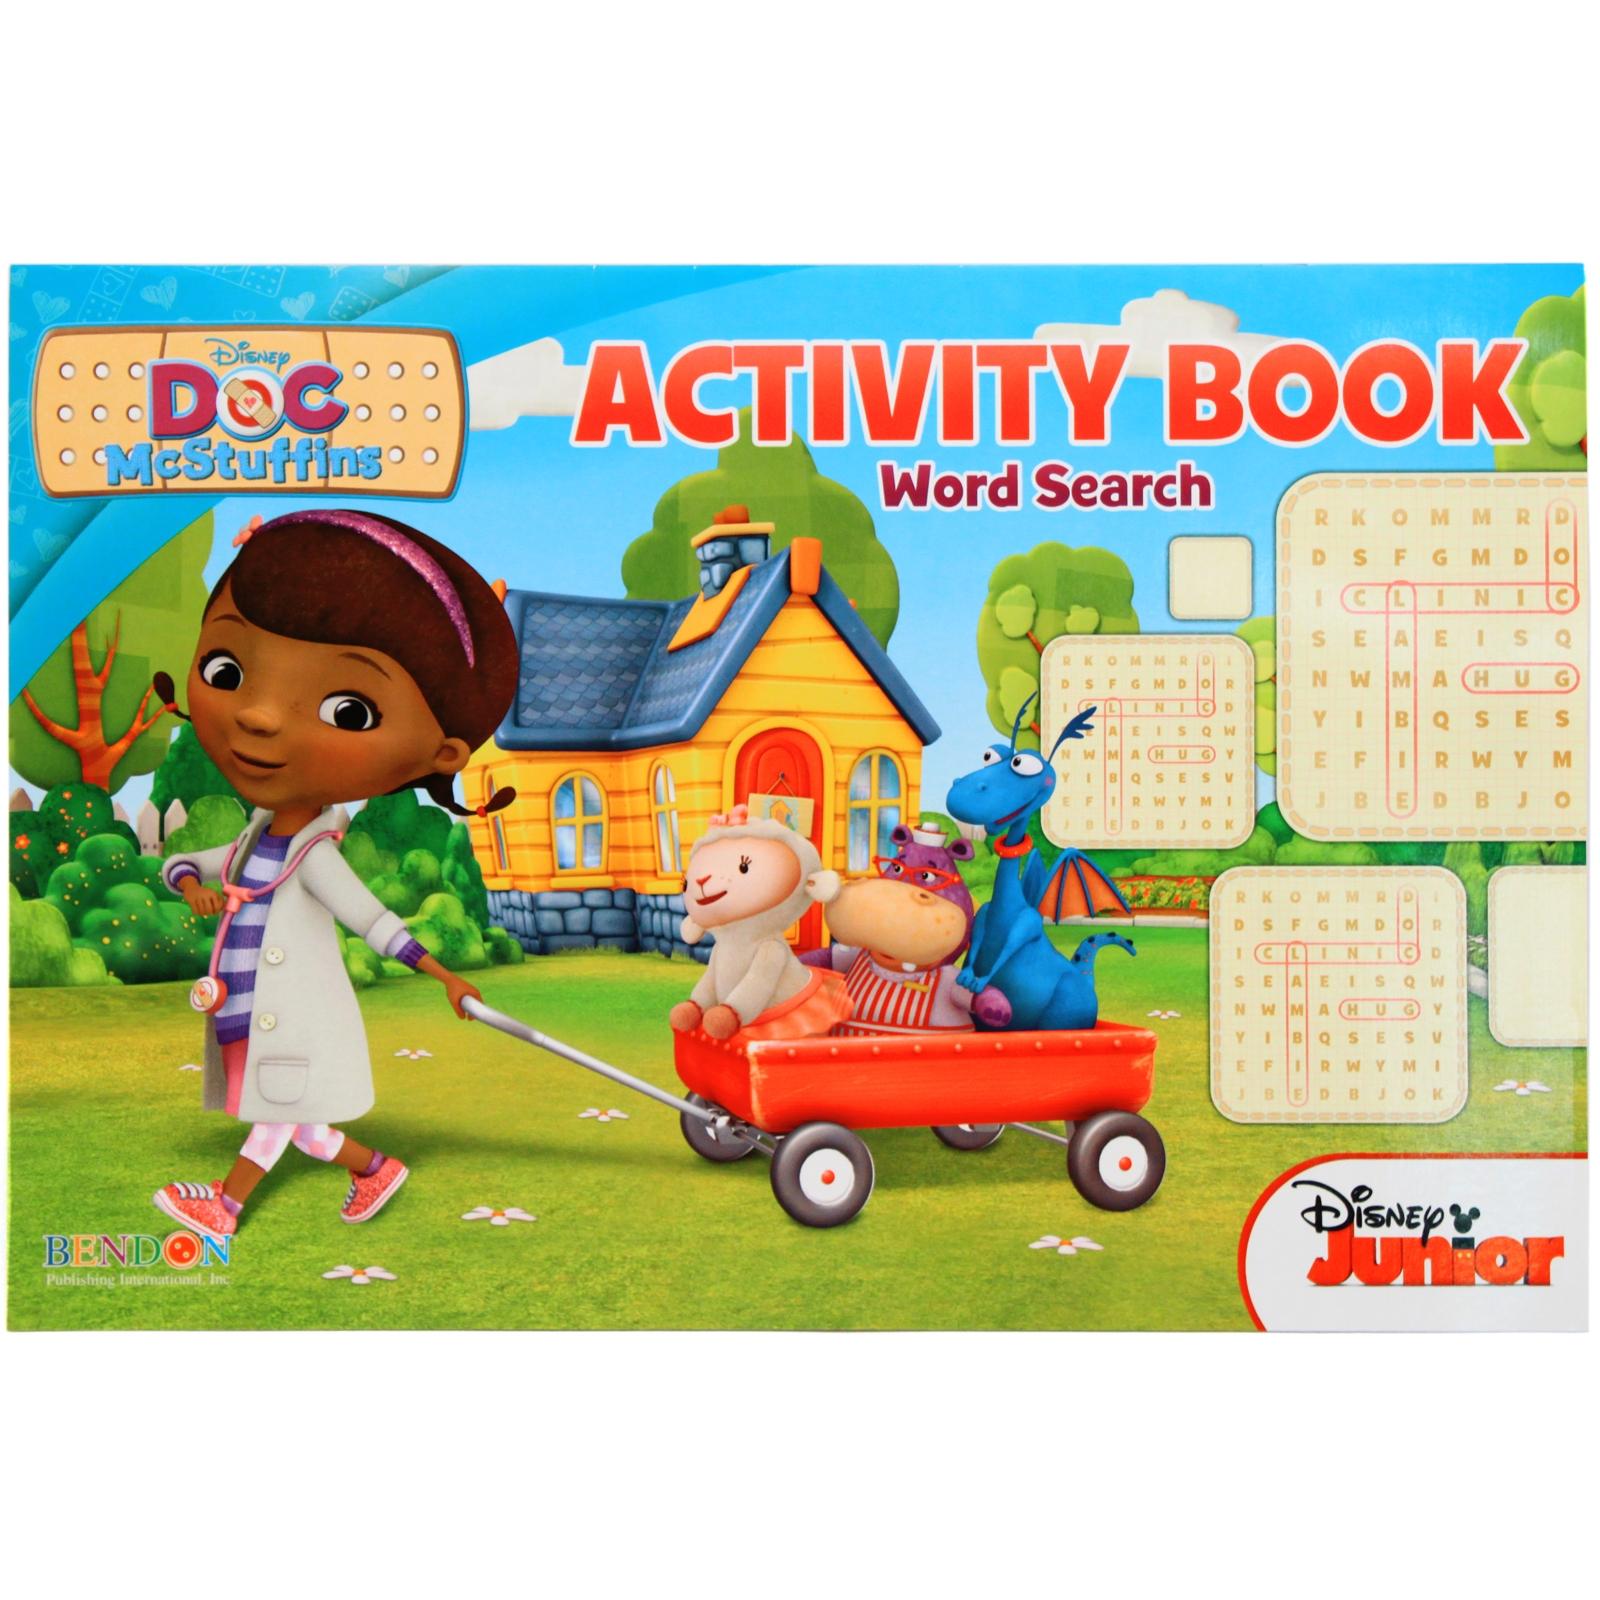 Childrens educational coloring activity book - Doc Mcstuffins Activity Book Cover